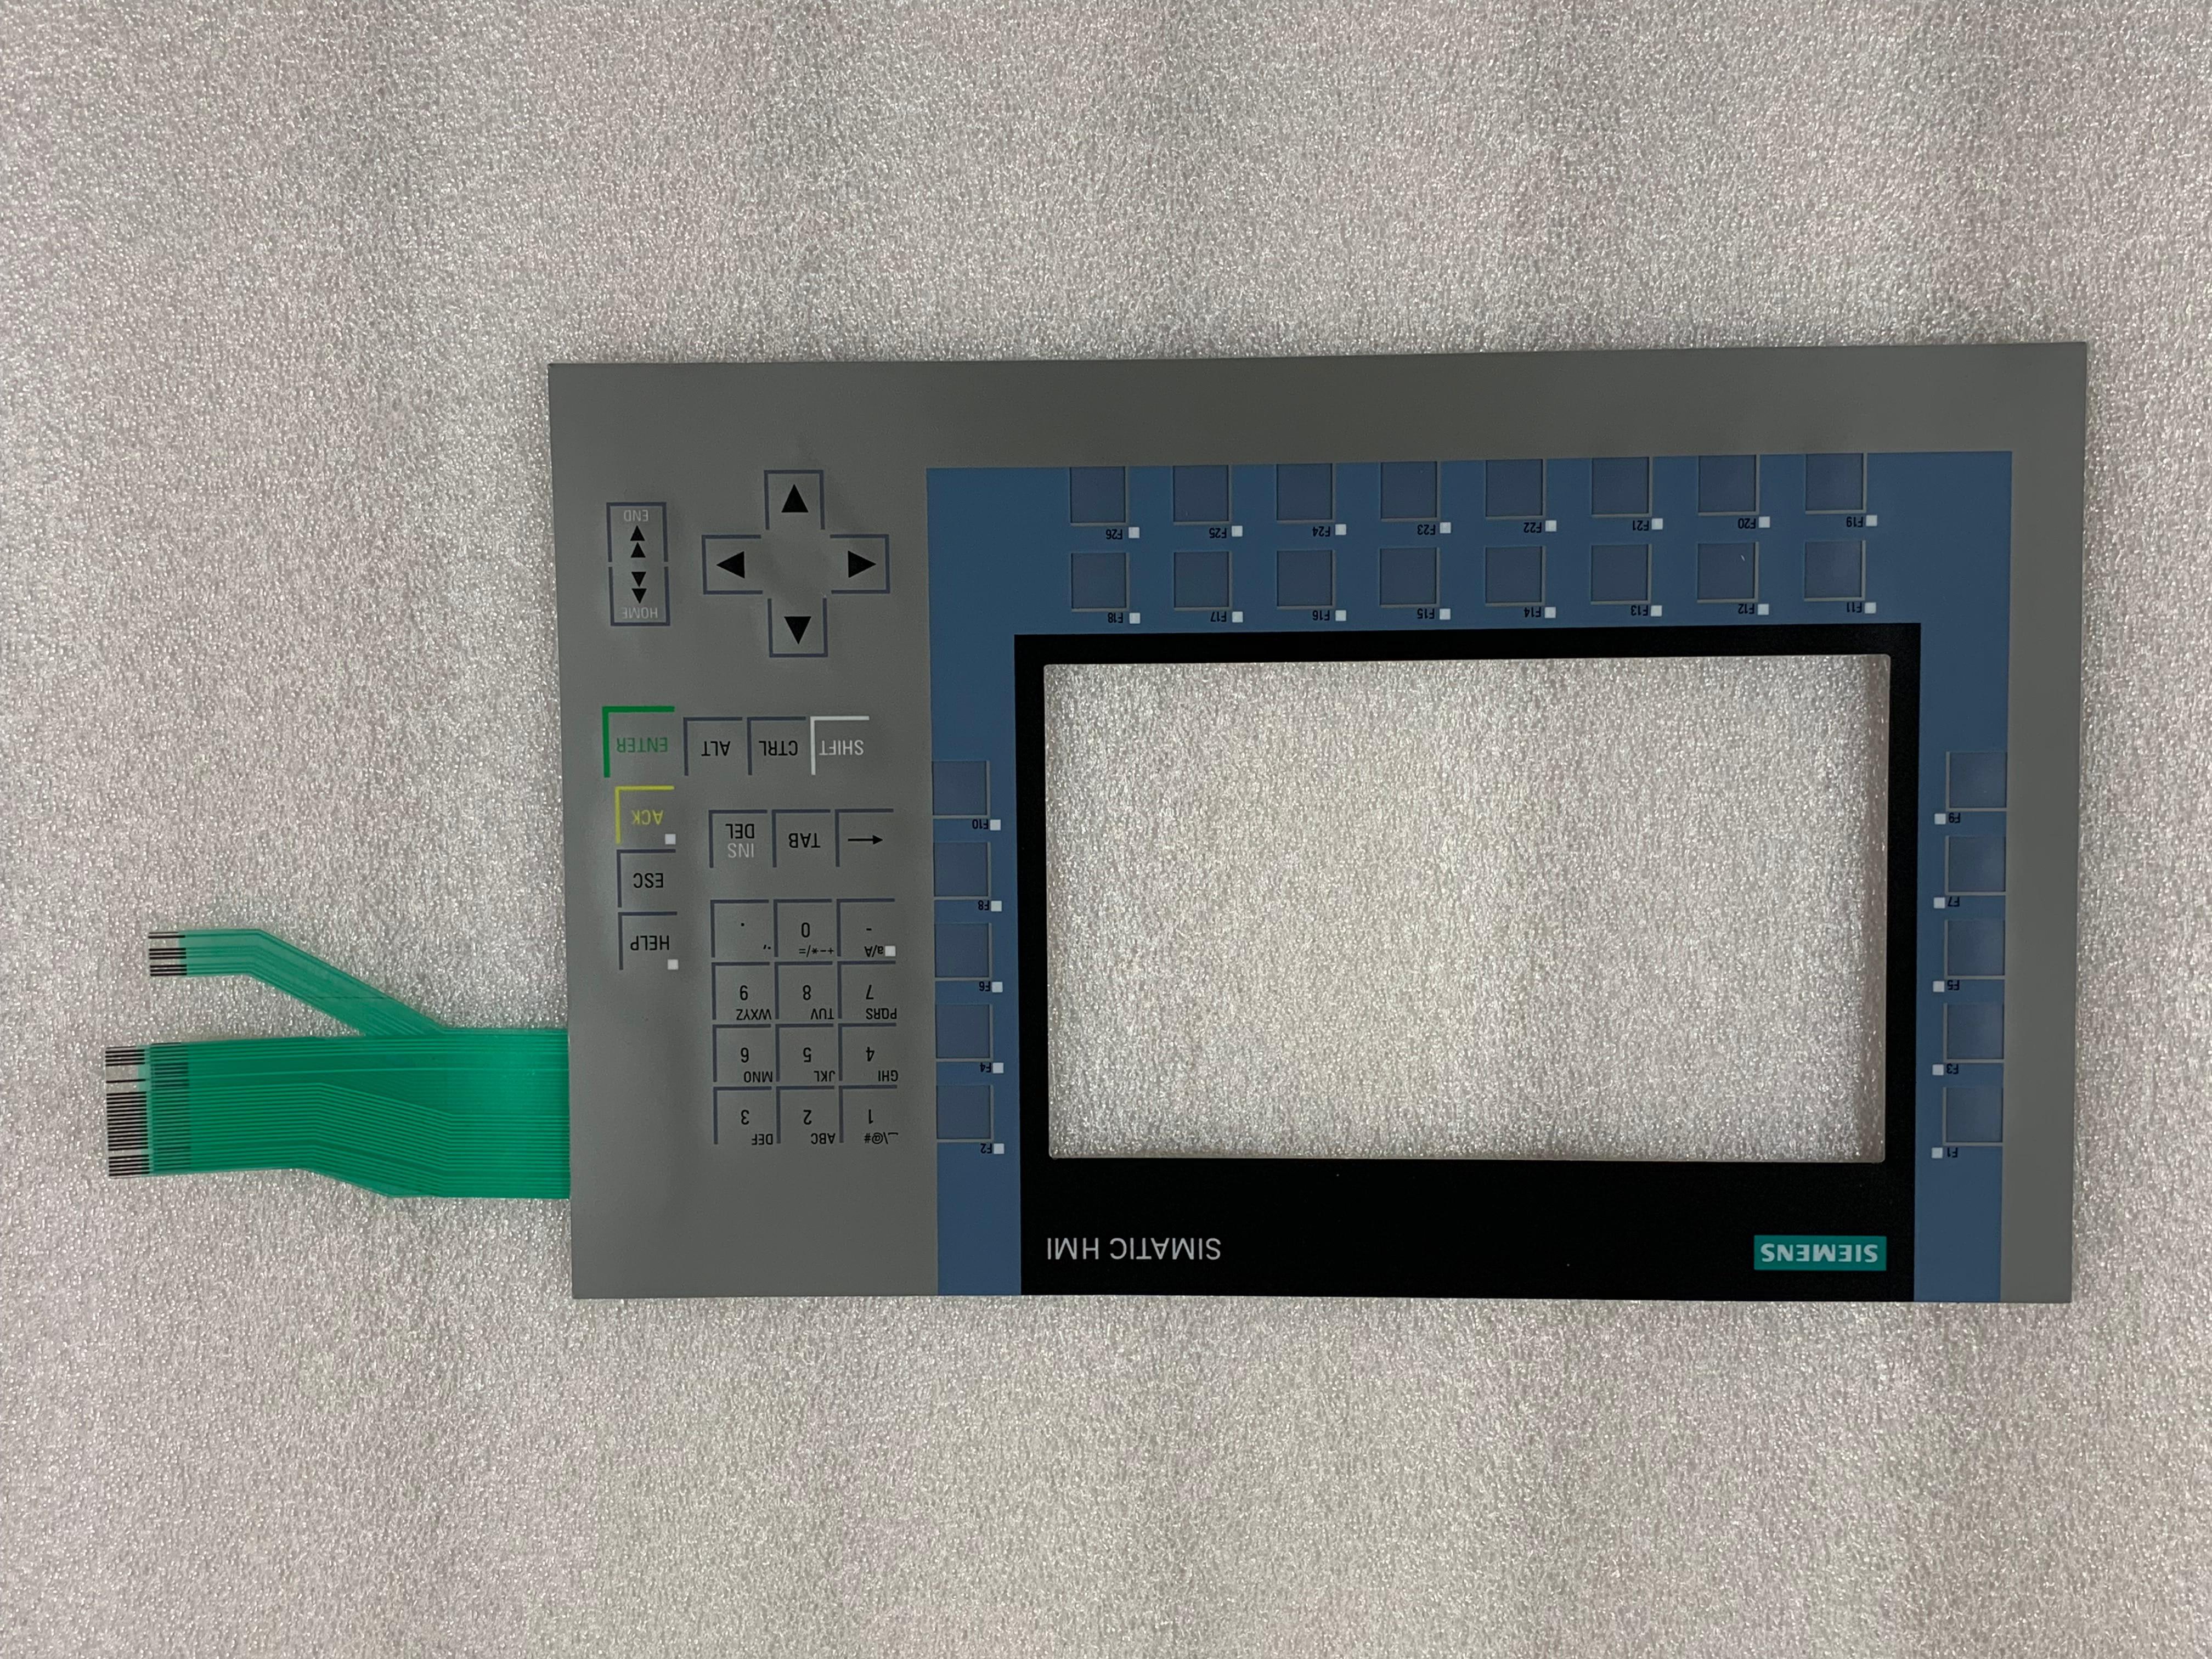 6AV2124-1JC01-0AX0 KP900  New Keypad (Membrane) In Stock